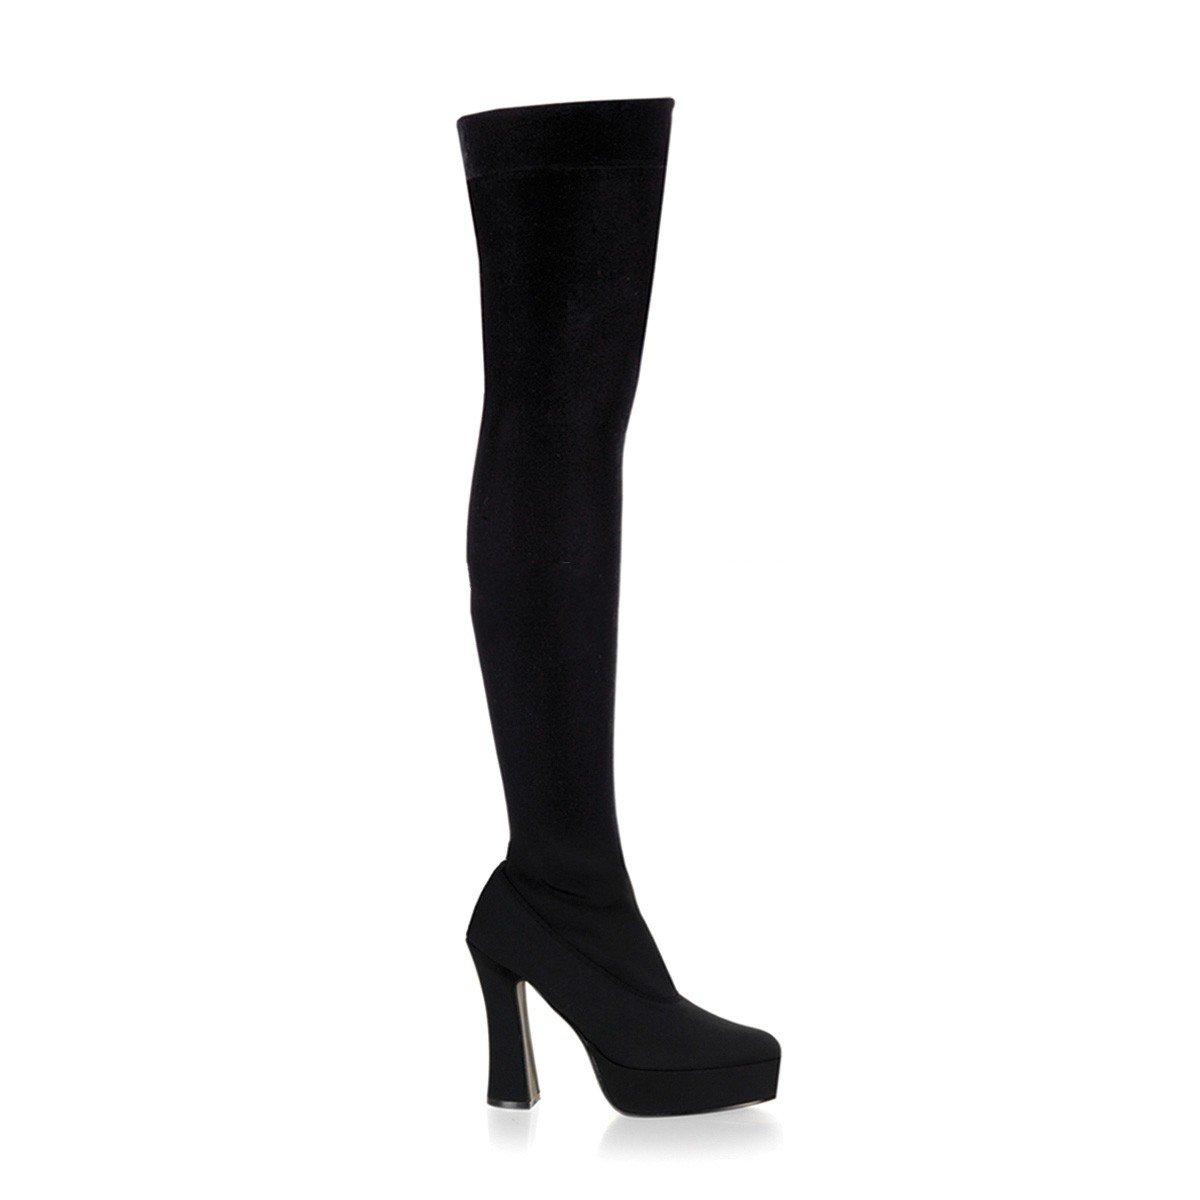 Pleaser Electra-3000 - Sexy Komfort Plateau-Stiefel High Heels Heels Heels 36-48 Größe EU-39   US-9   UK-6 9fcac1